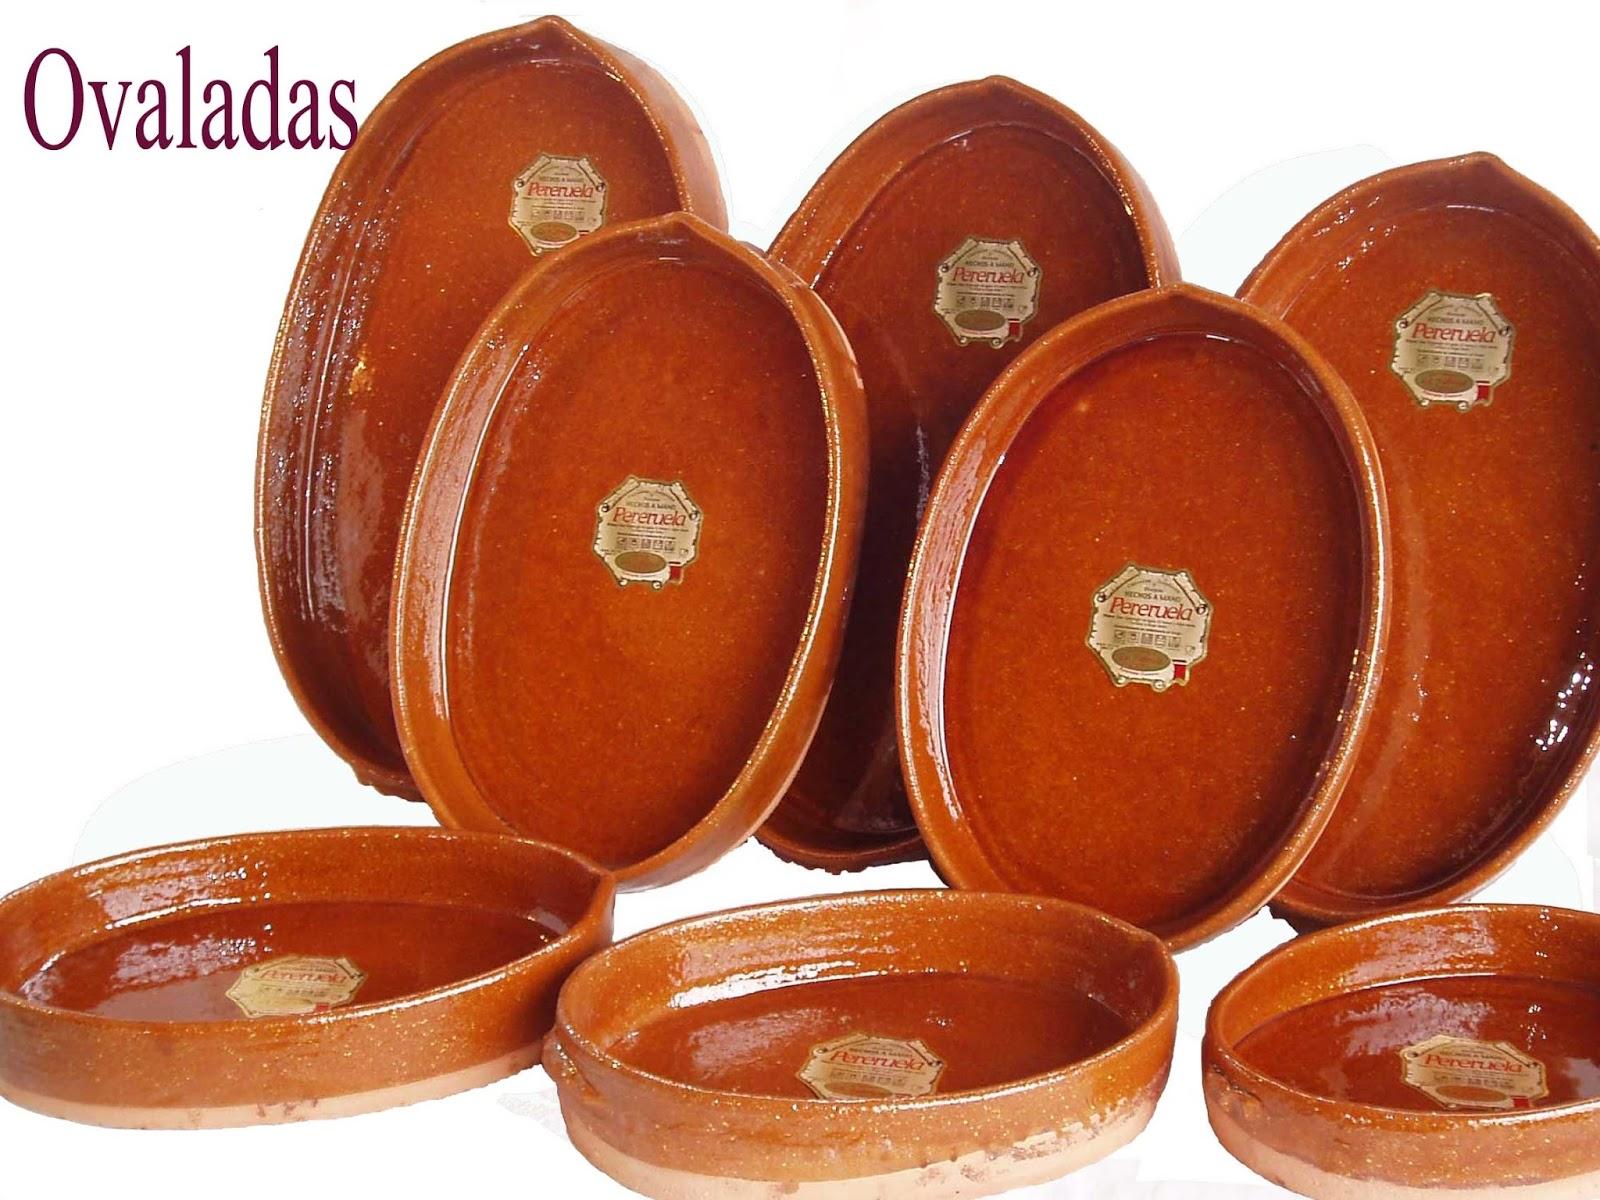 Hornos de le a pereruela cazuelas de barro for Faroles de barro para jardin